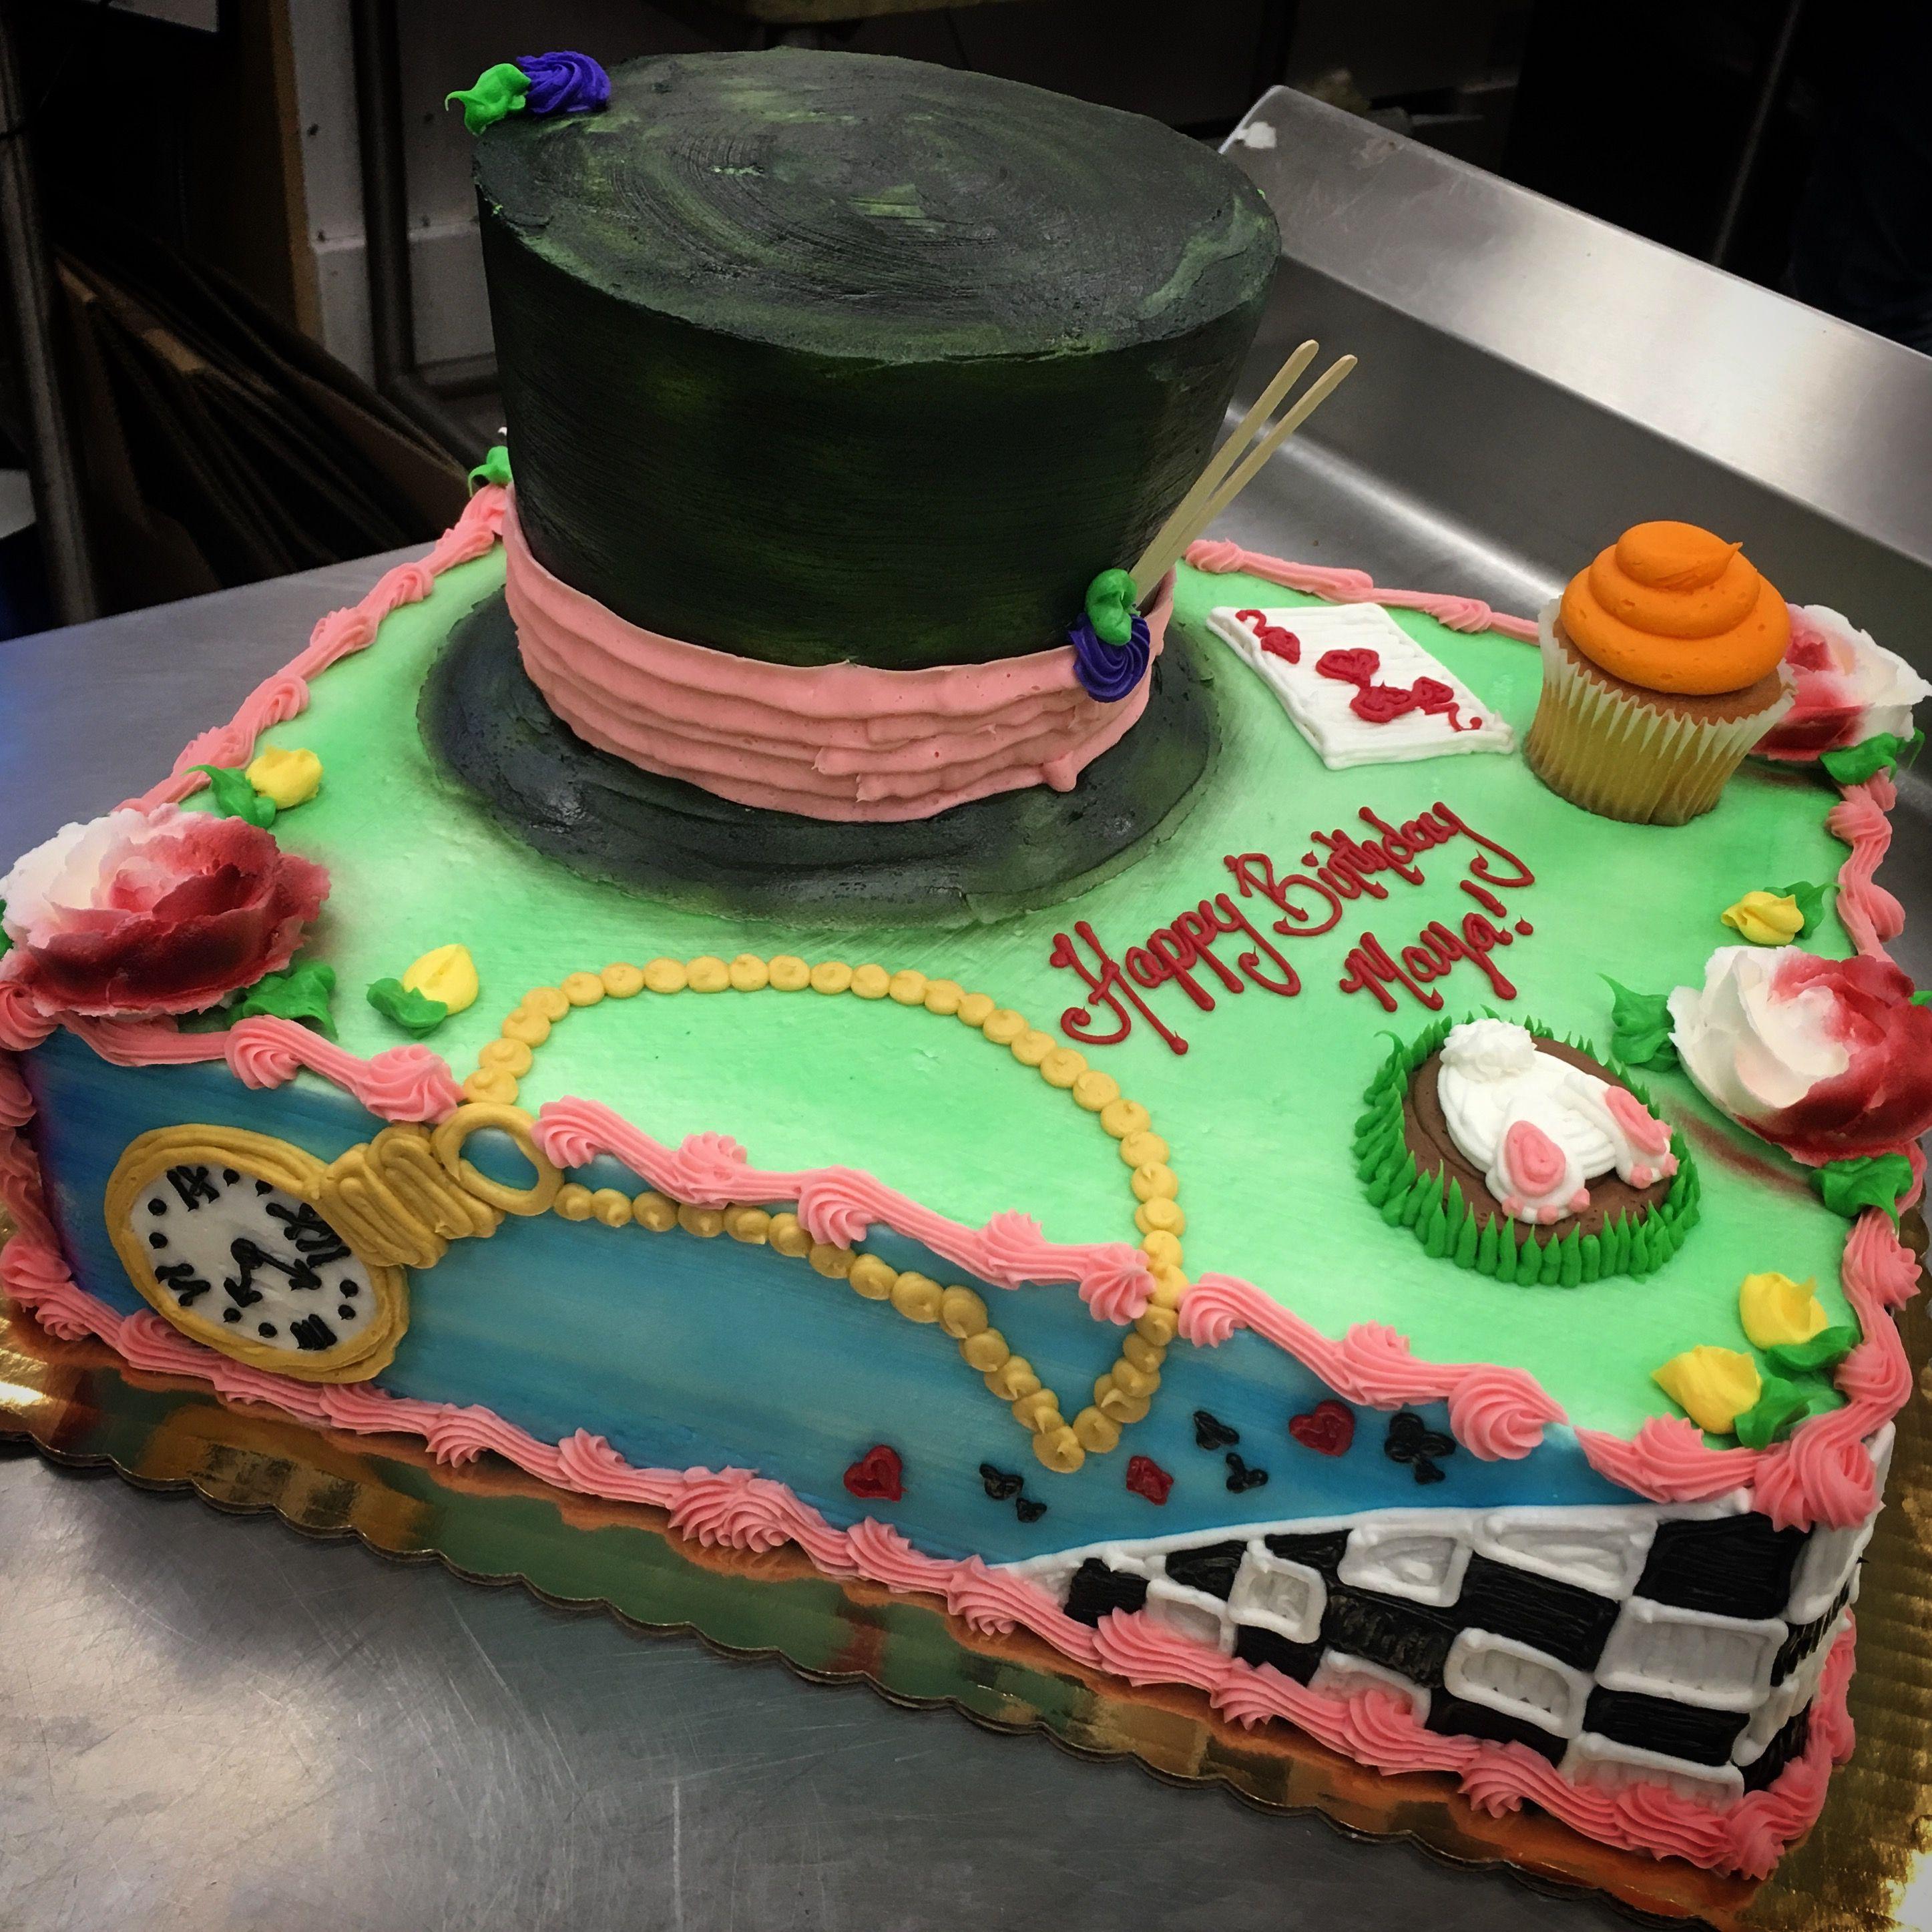 Alice And Wonderland Themed Sheet Cake My Work